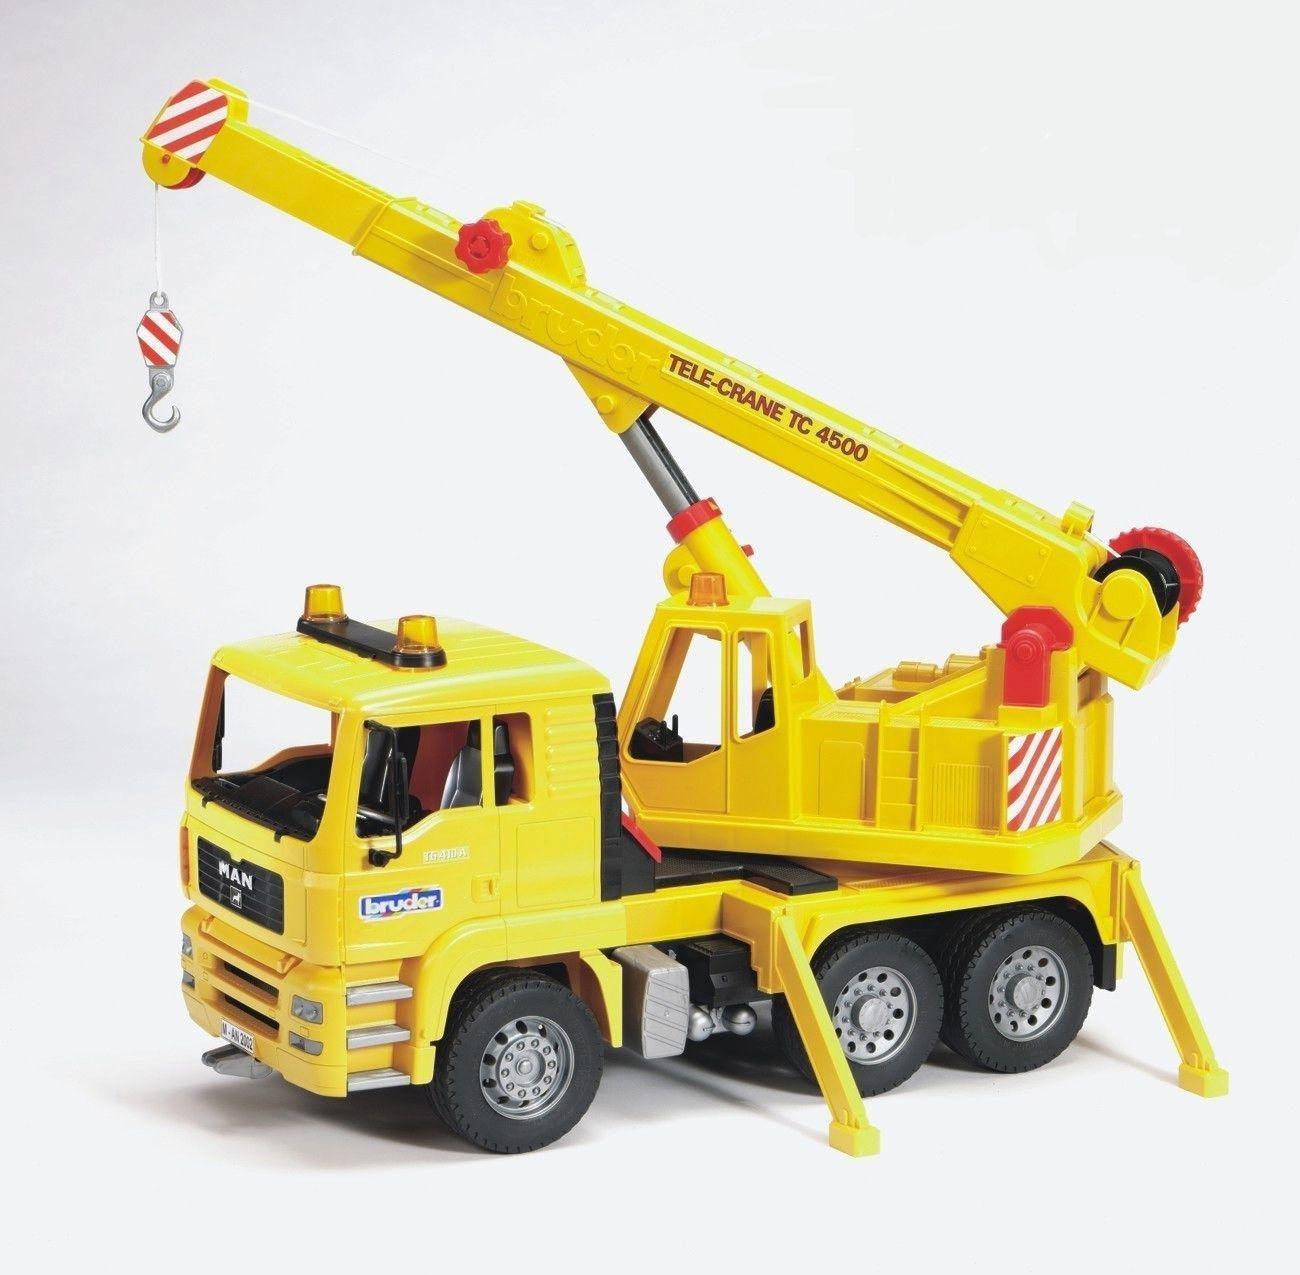 Image of Bruder 02754 MAN TGA Crane Truck.